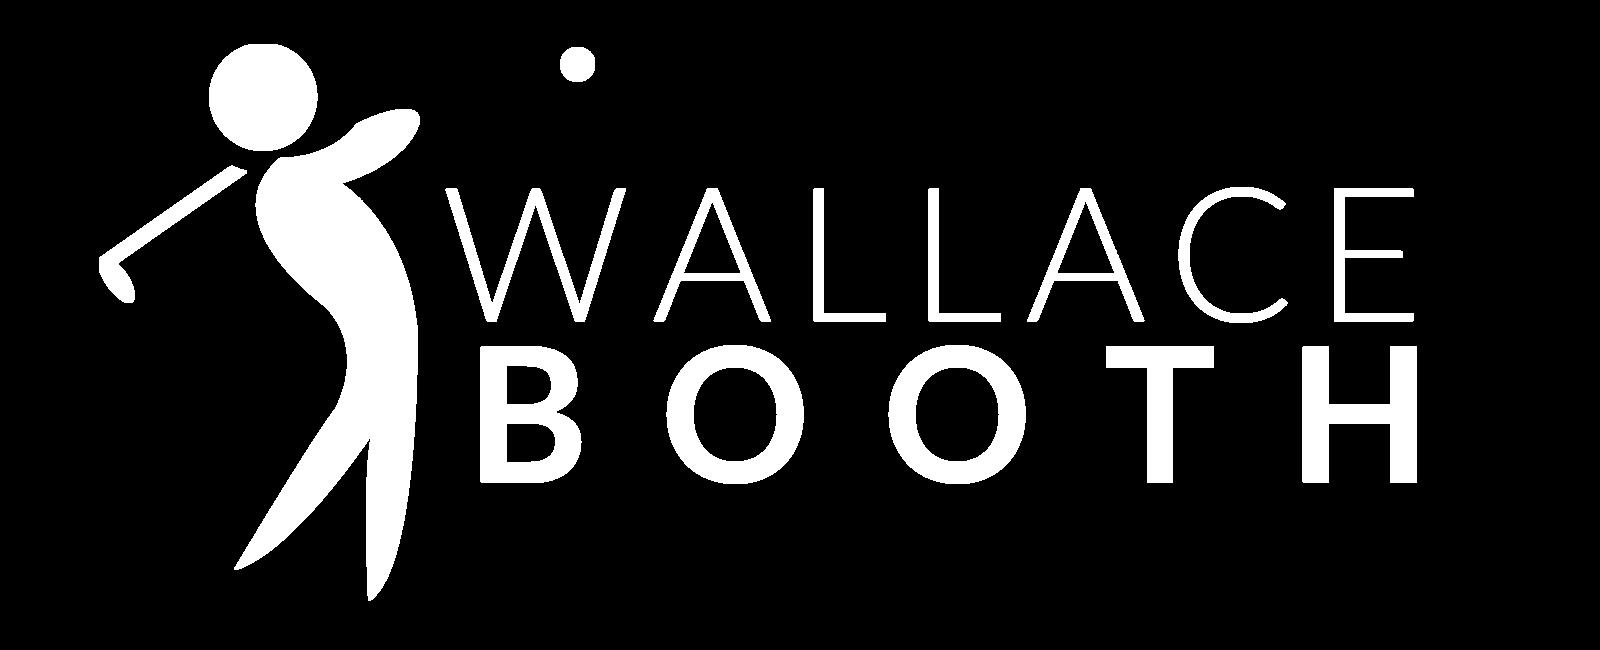 WallaceBoothWhite